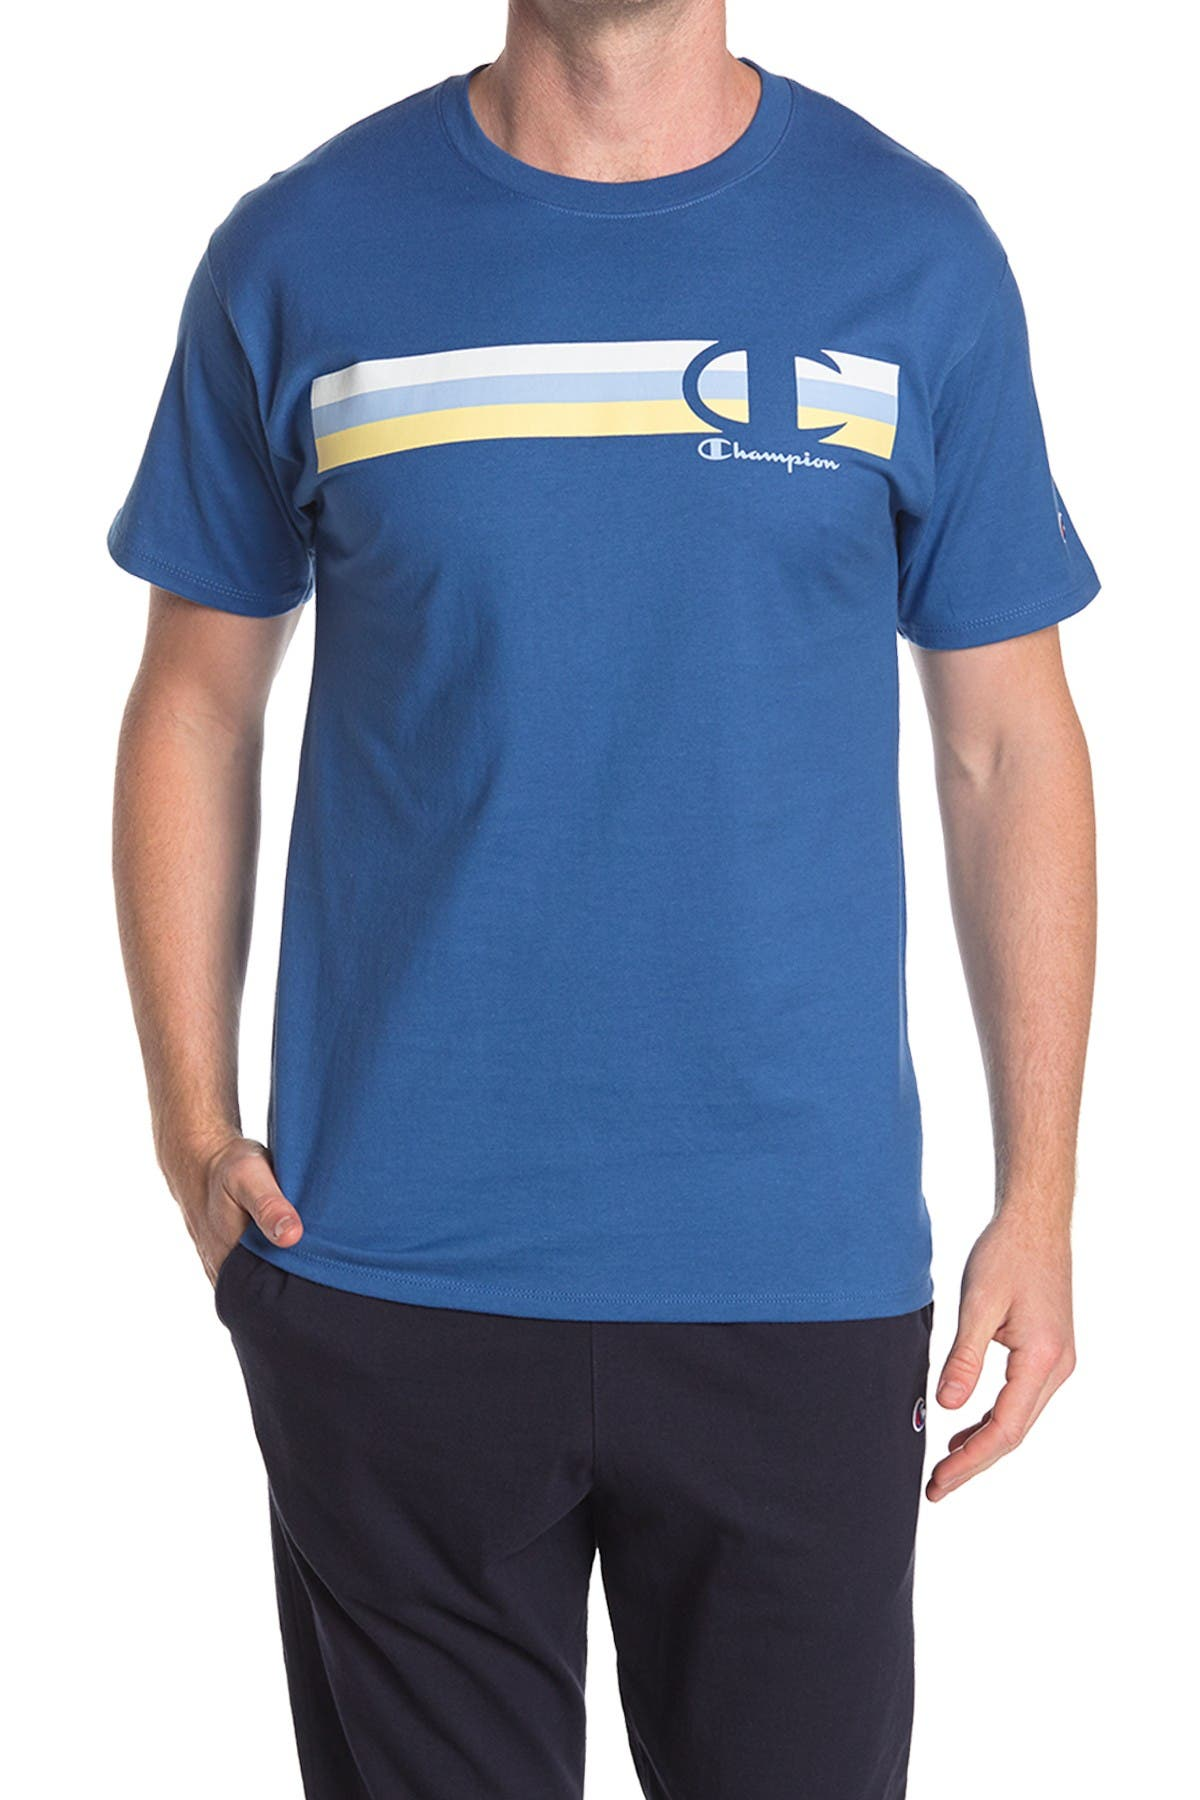 Image of Champion Graphic Crew Neck T-Shirt